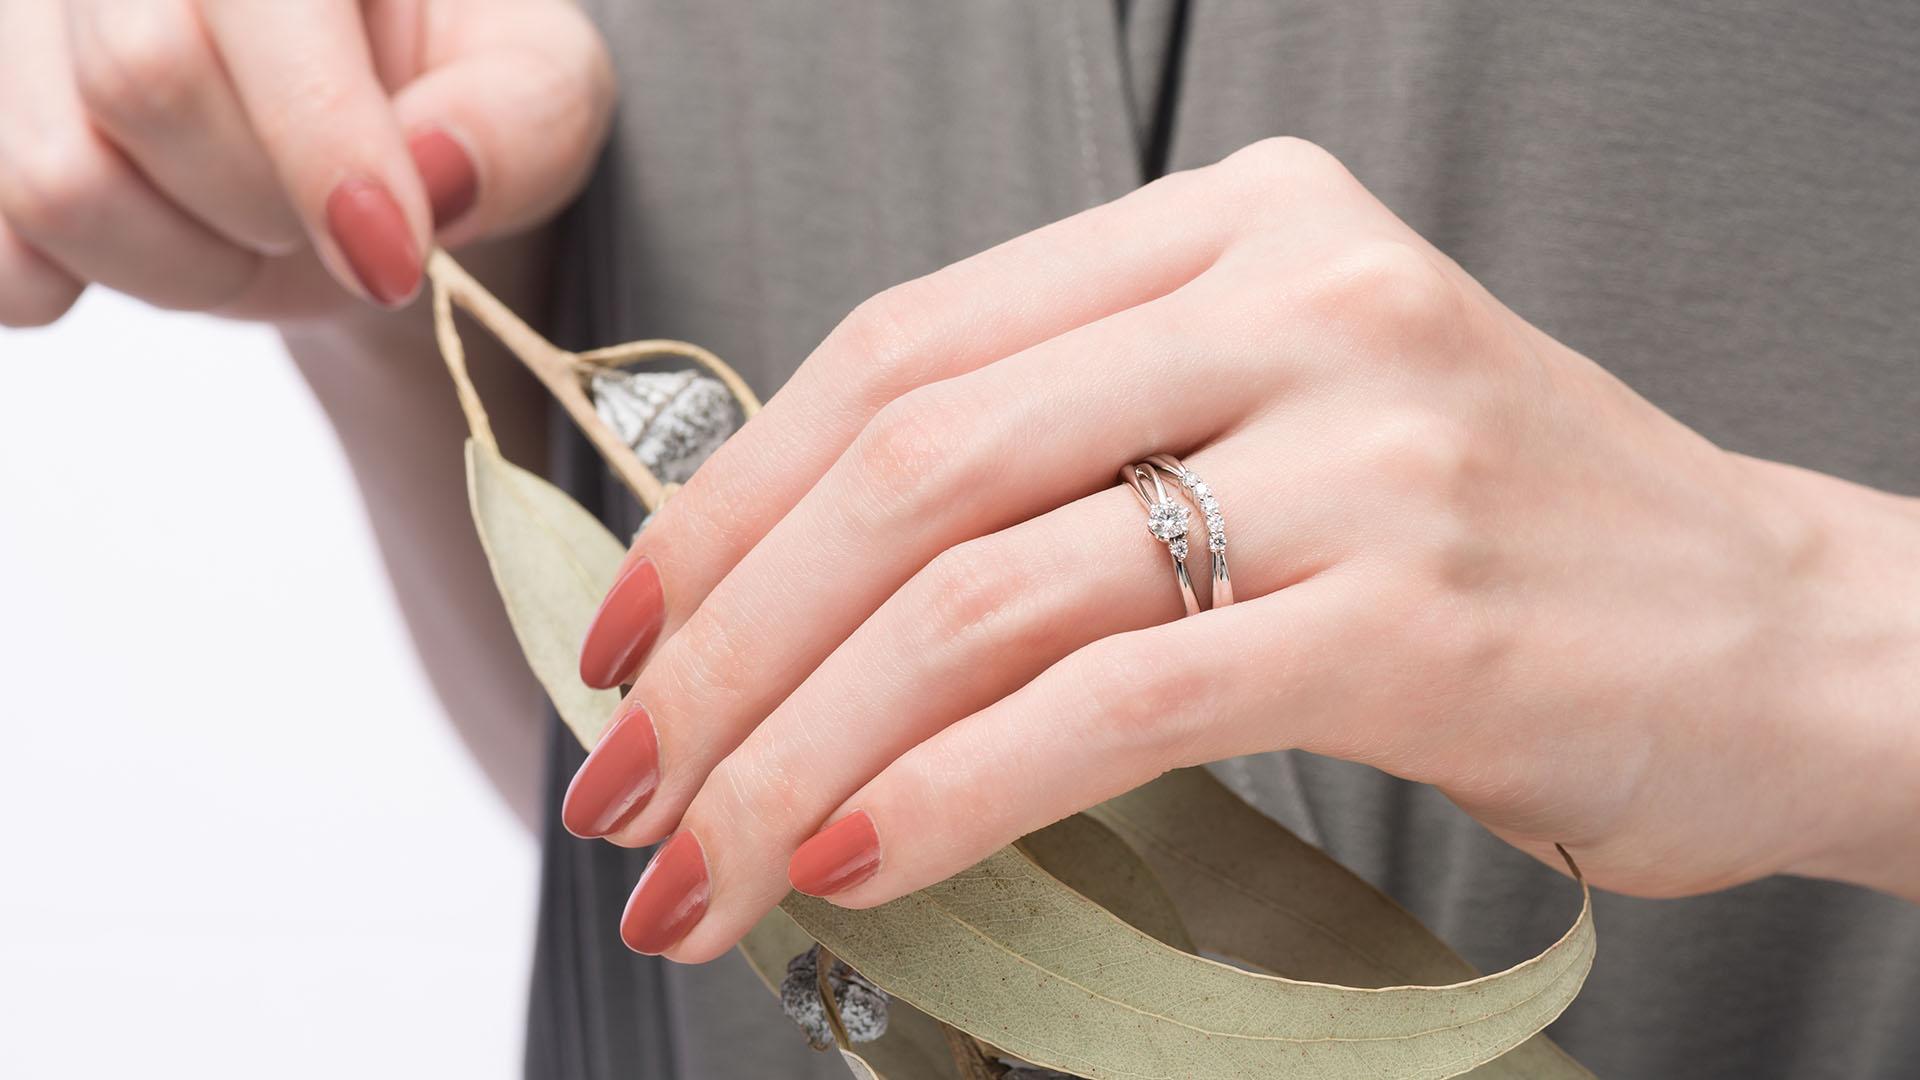 justia ジャスティア | 結婚指輪サムネイル 3